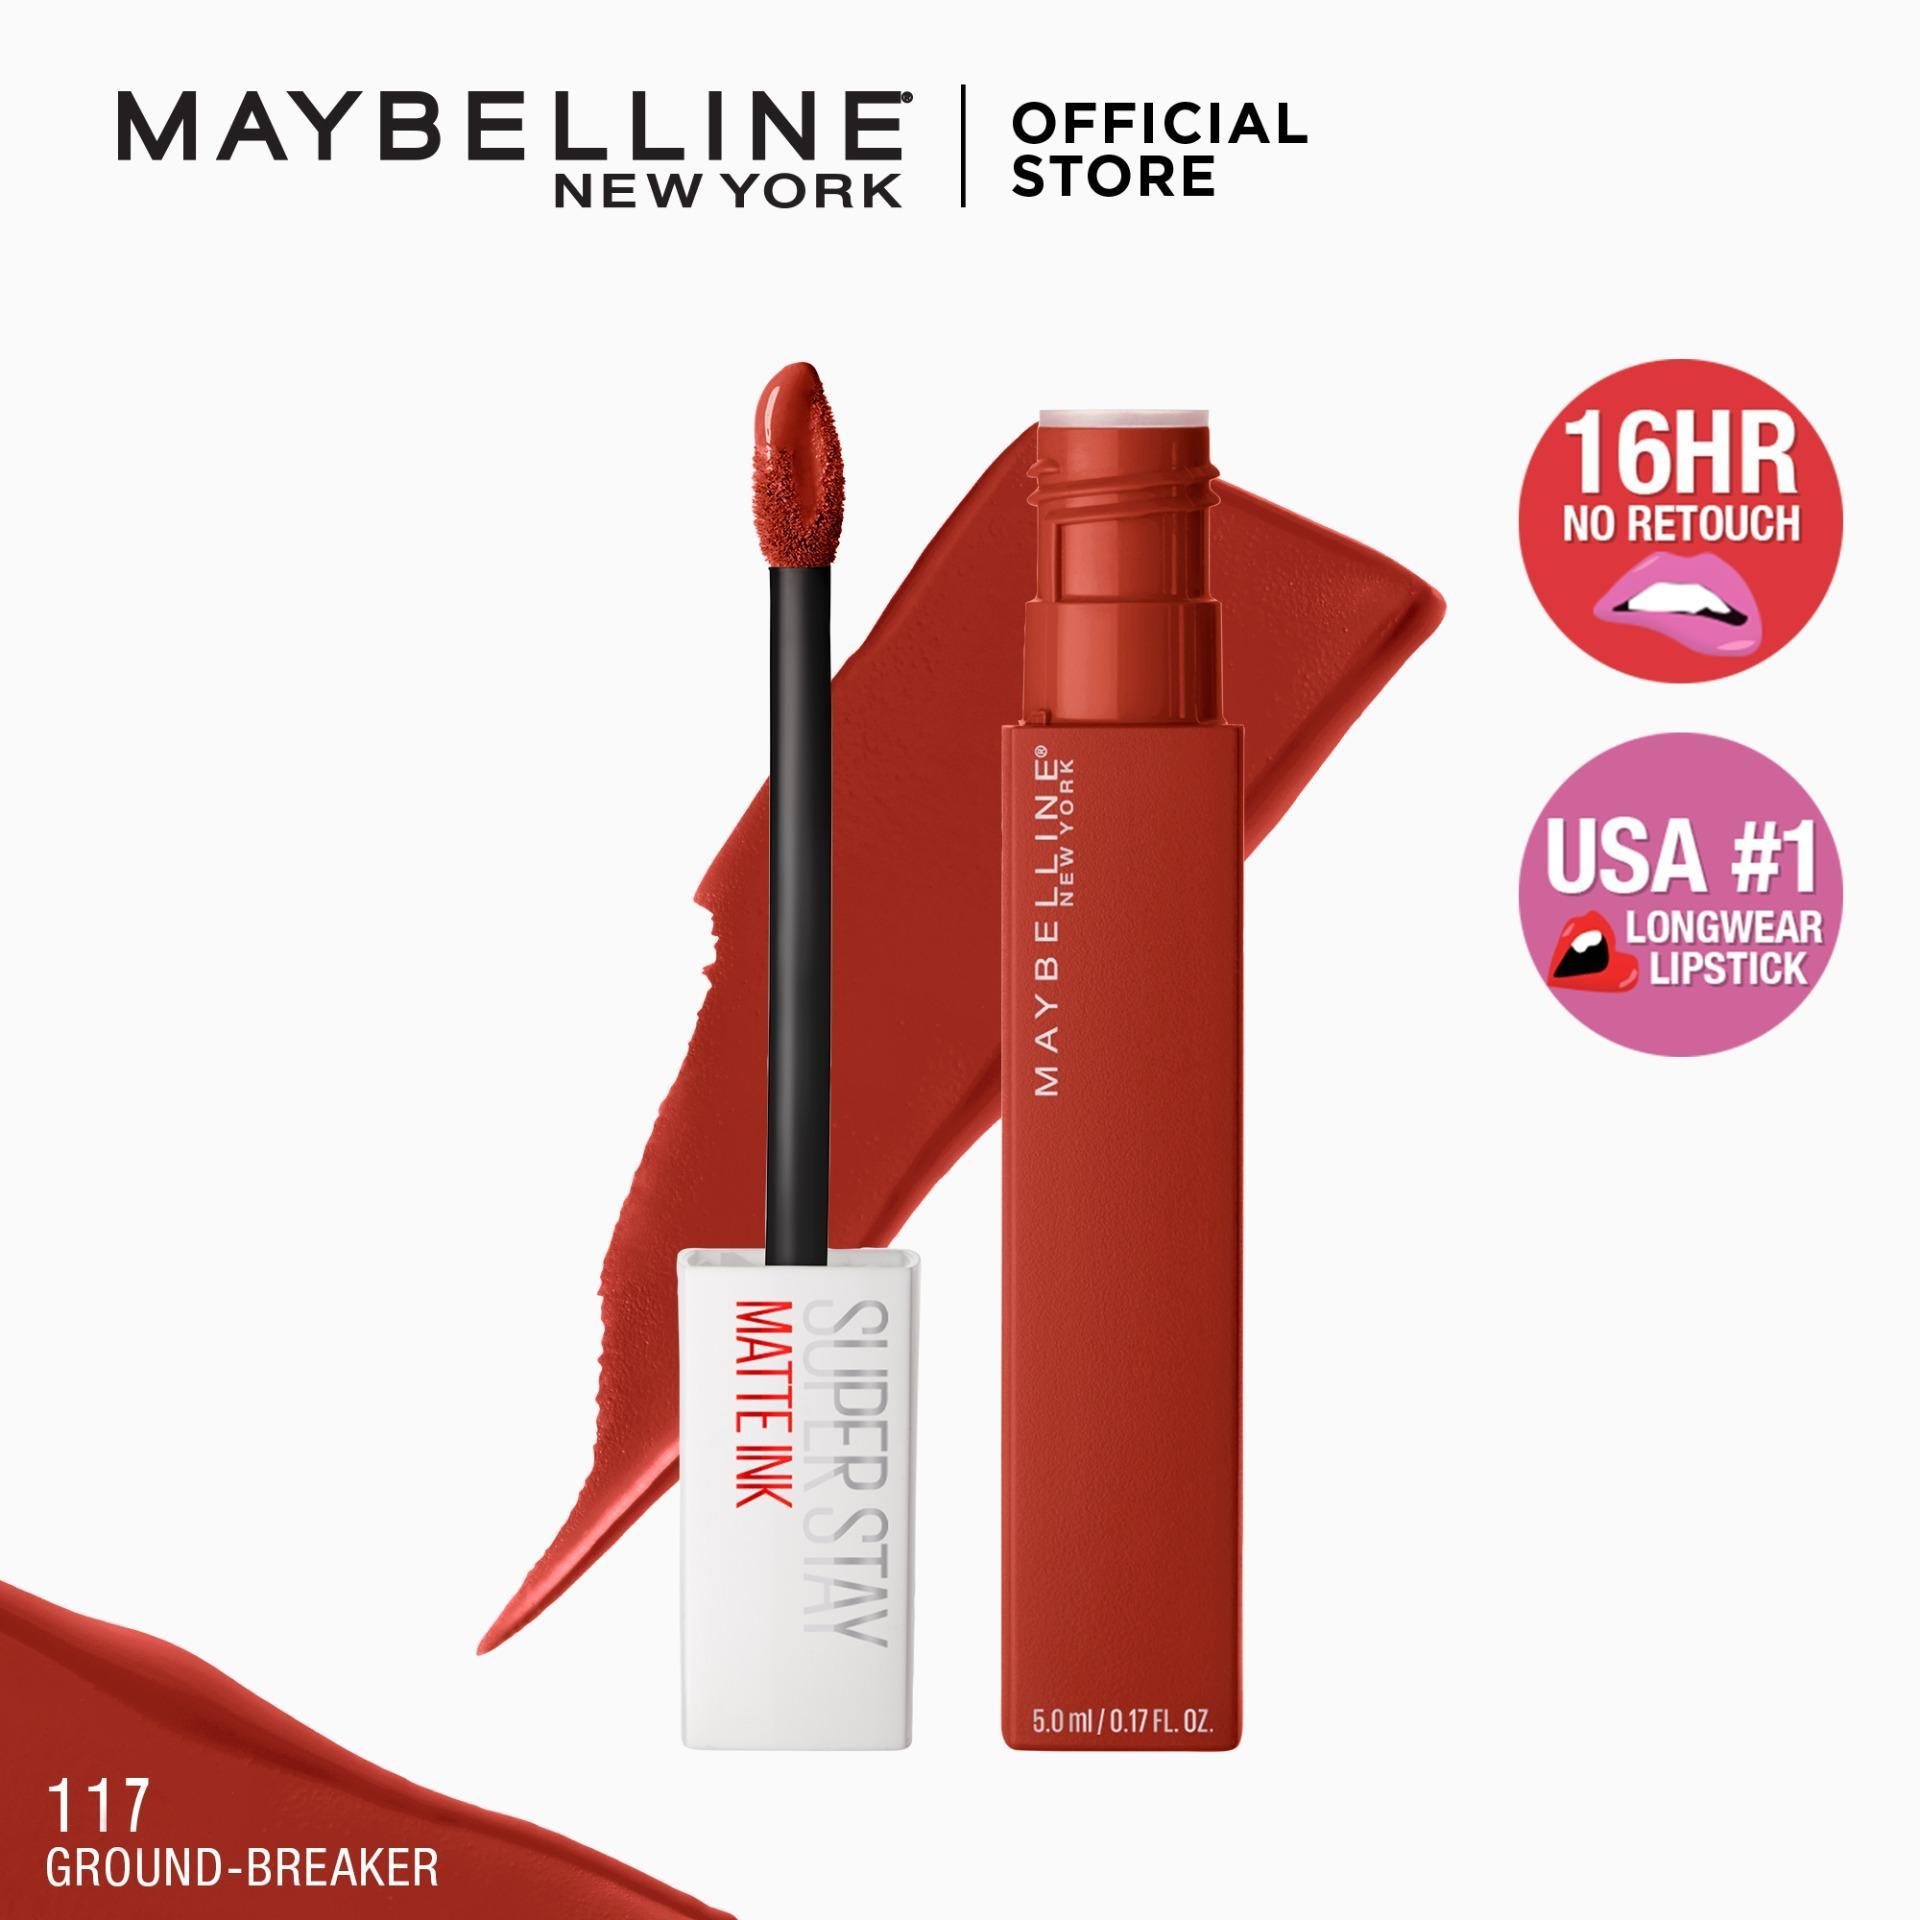 Maybelline SuperStay Matte Ink Collection Liquid Lipstick [16HR Longwear, Waterproof]– Makeup [12. 12 Sale]